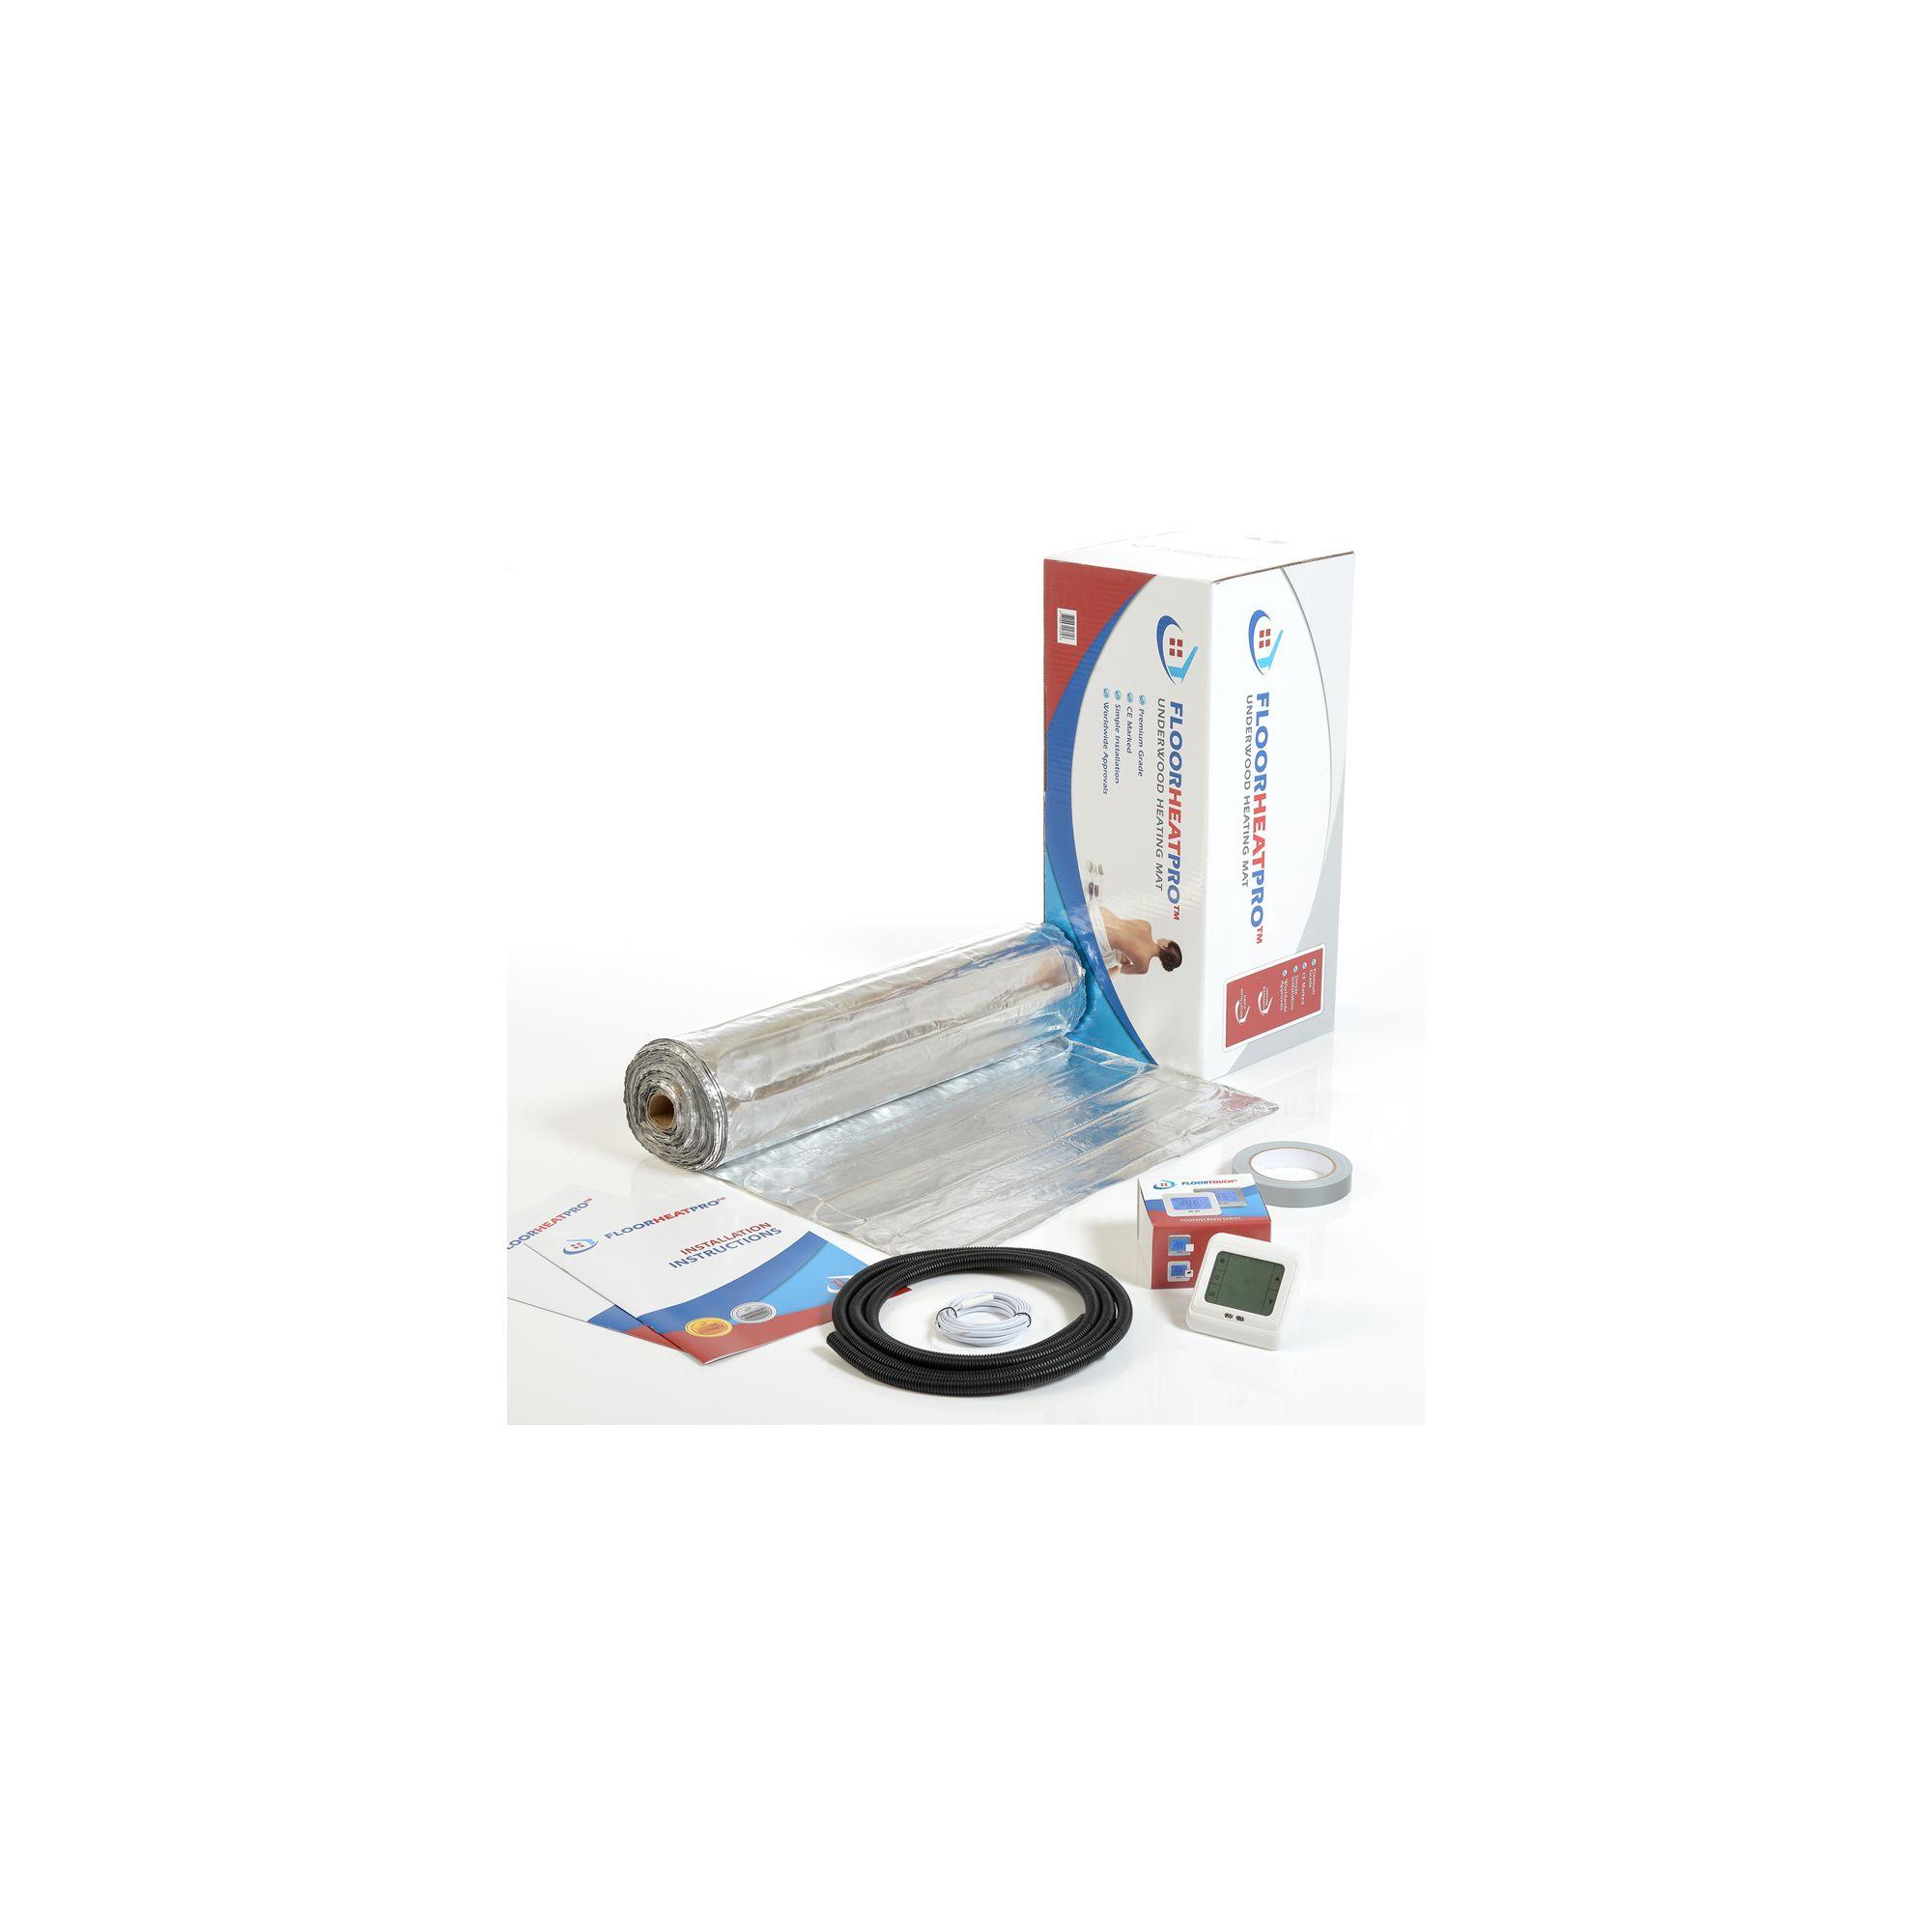 17.0 m2 - Underfloor Electric Heating Kit - Laminate at Tesco Direct